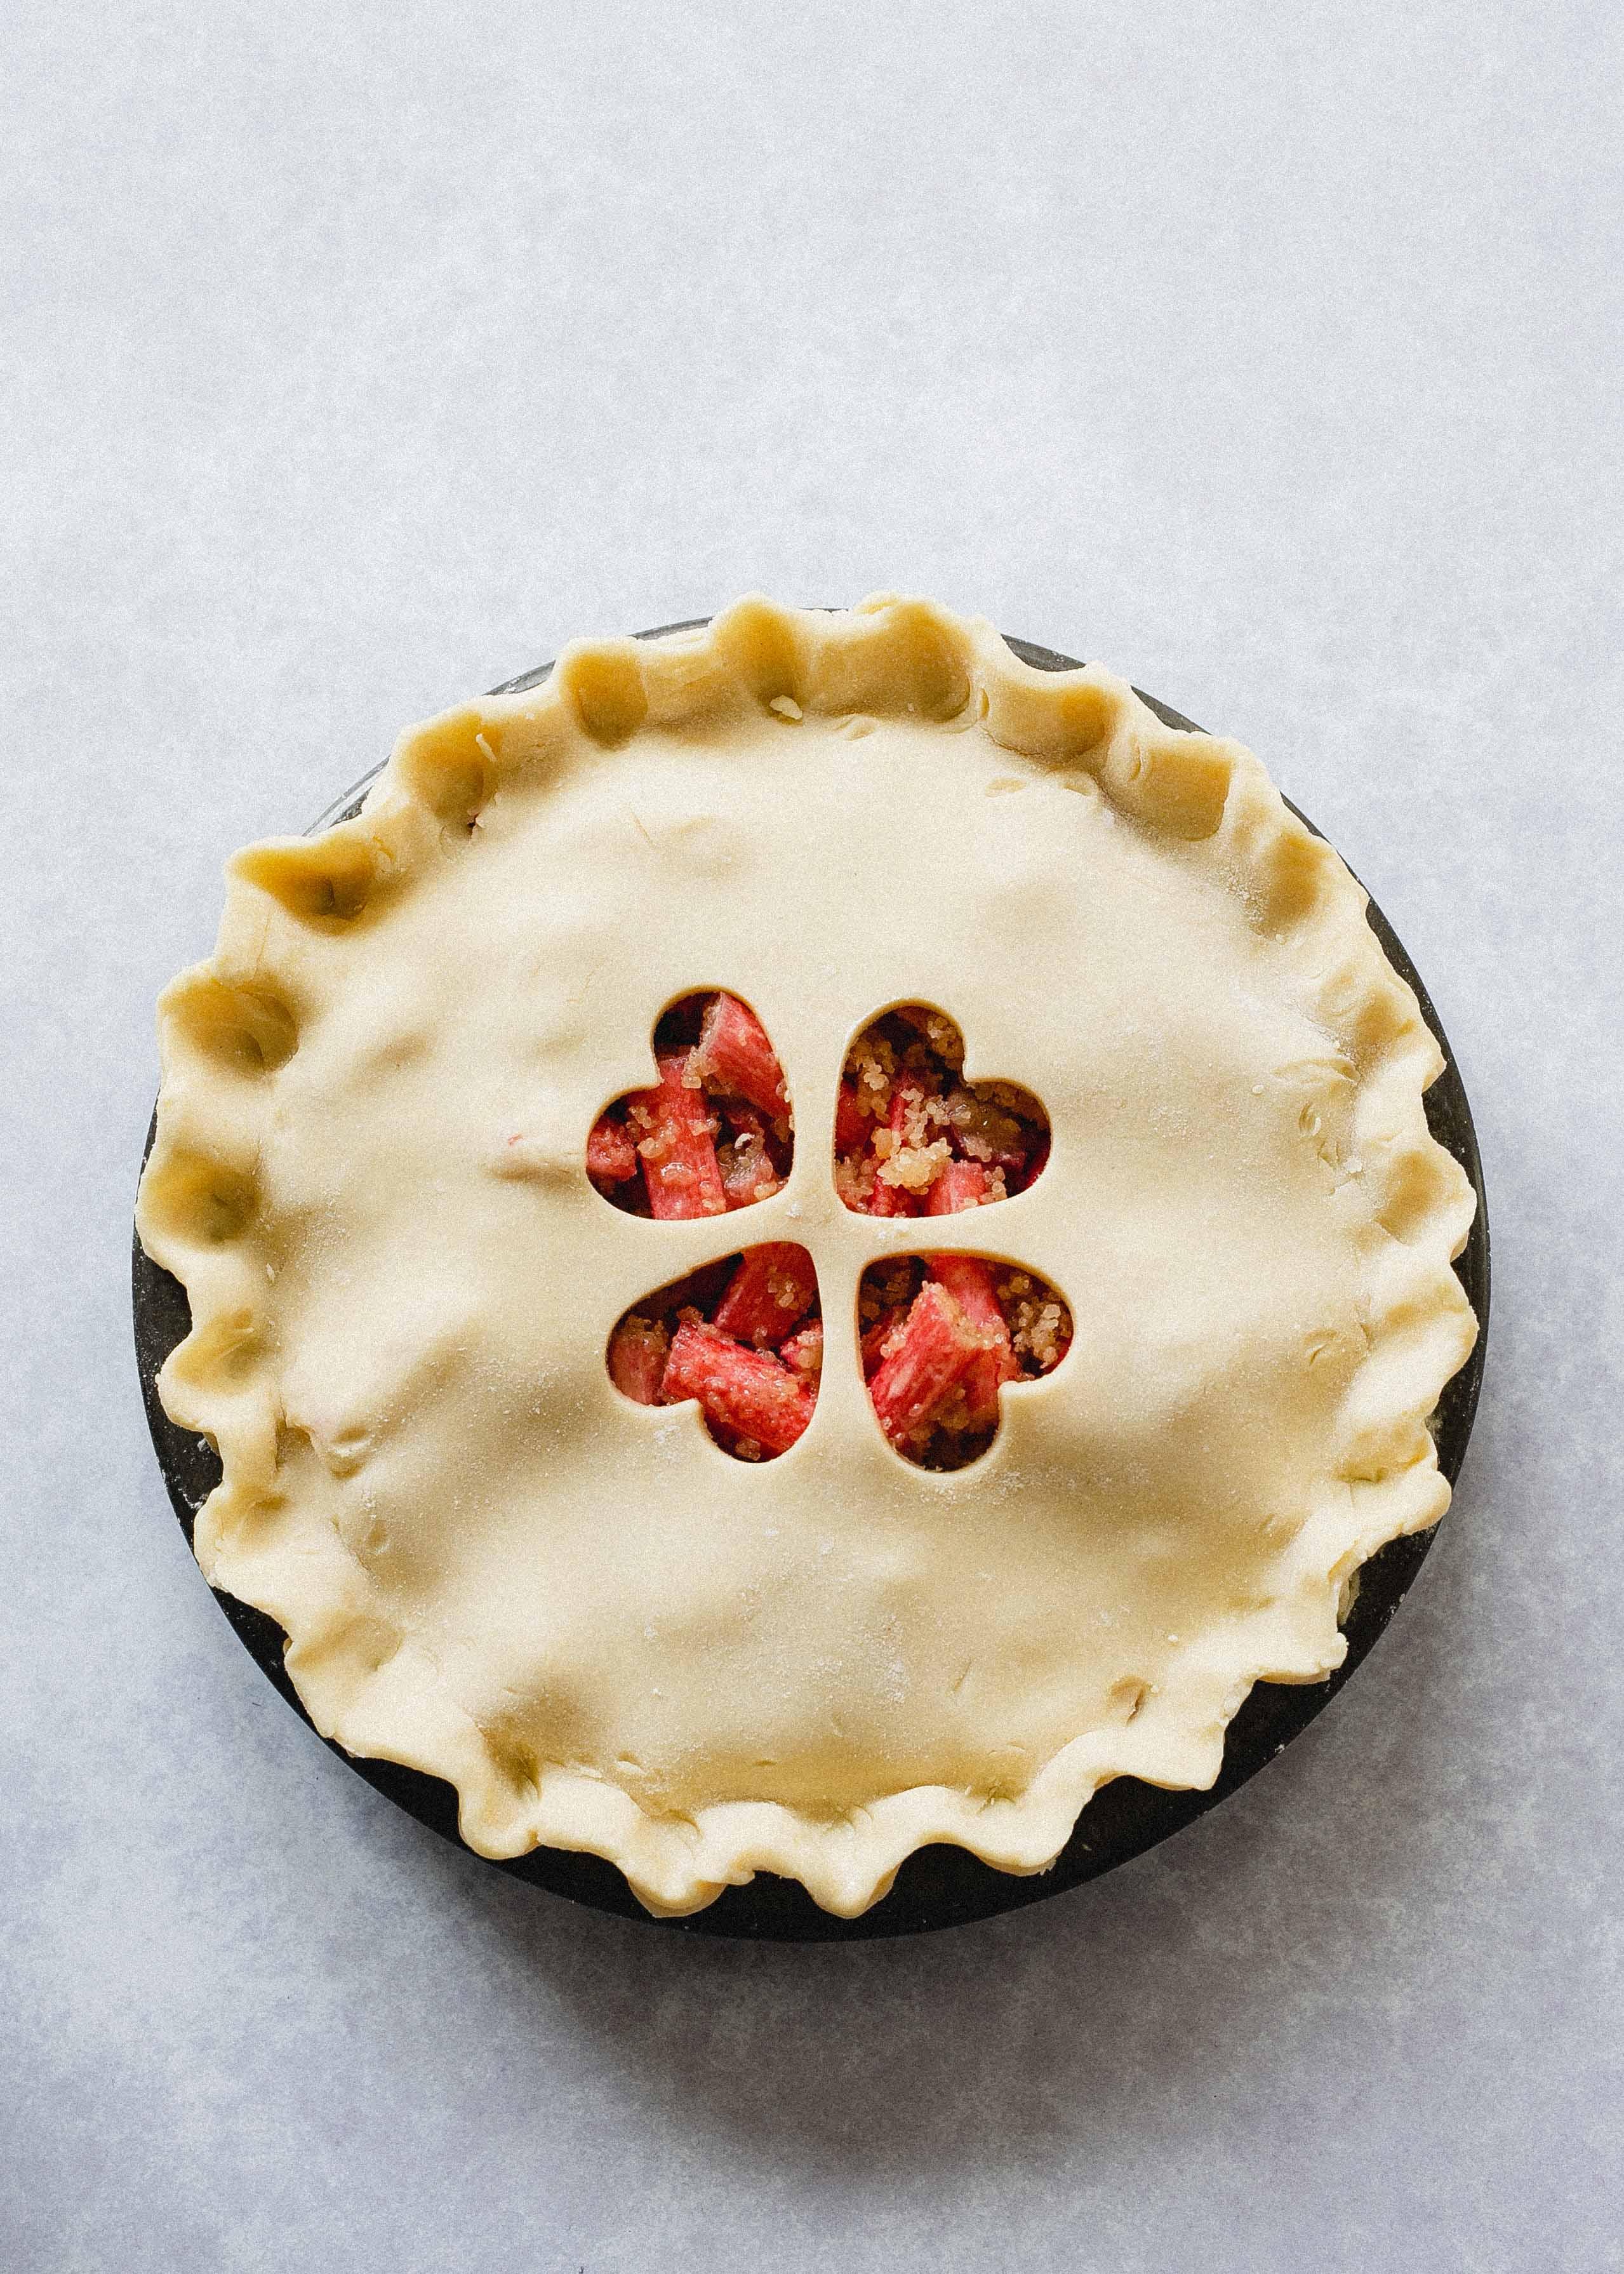 Low FODMAP rhubarb pie ready for baking